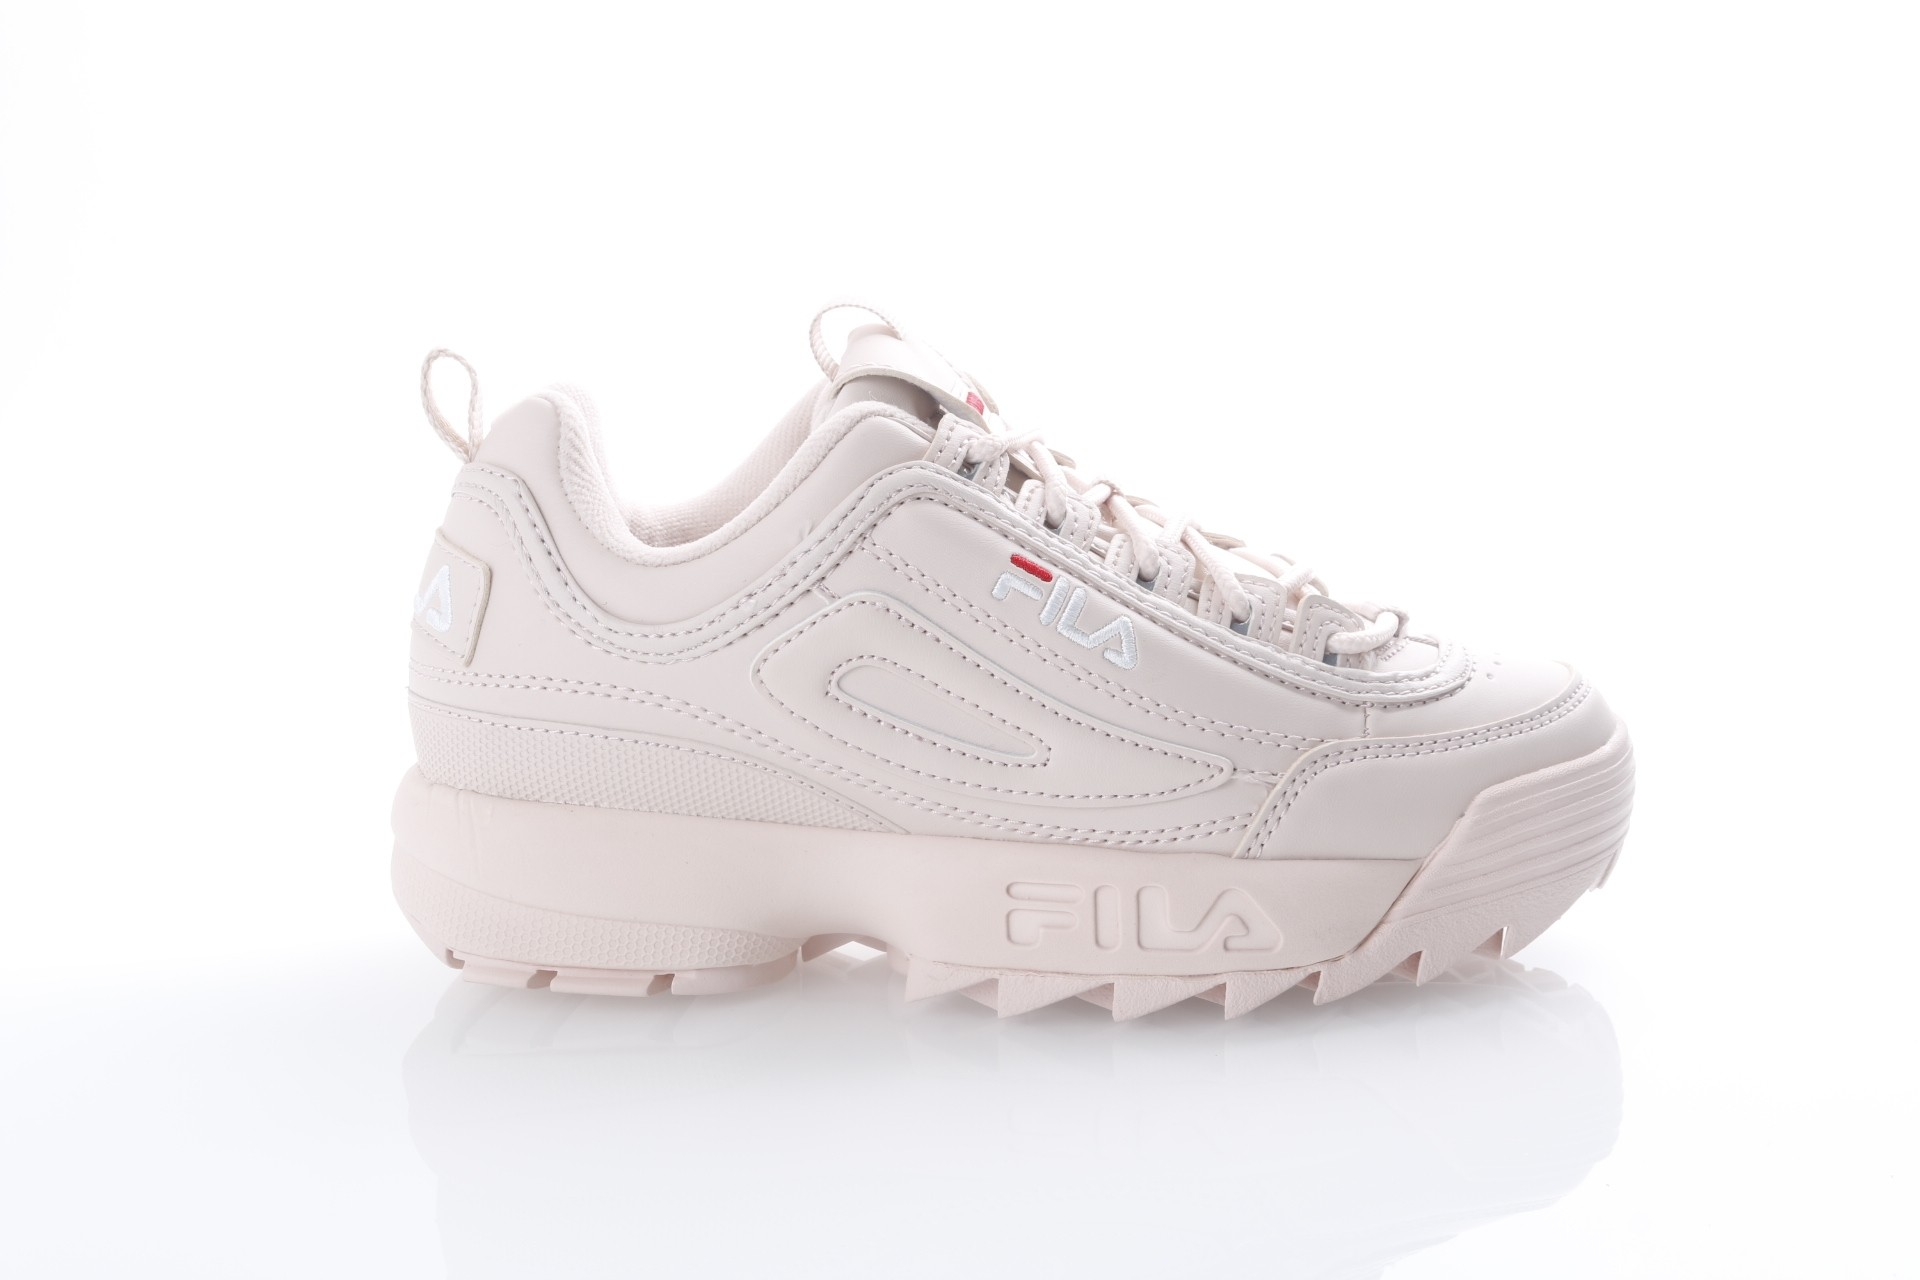 fila schoenen Sale,up to 70% Discounts